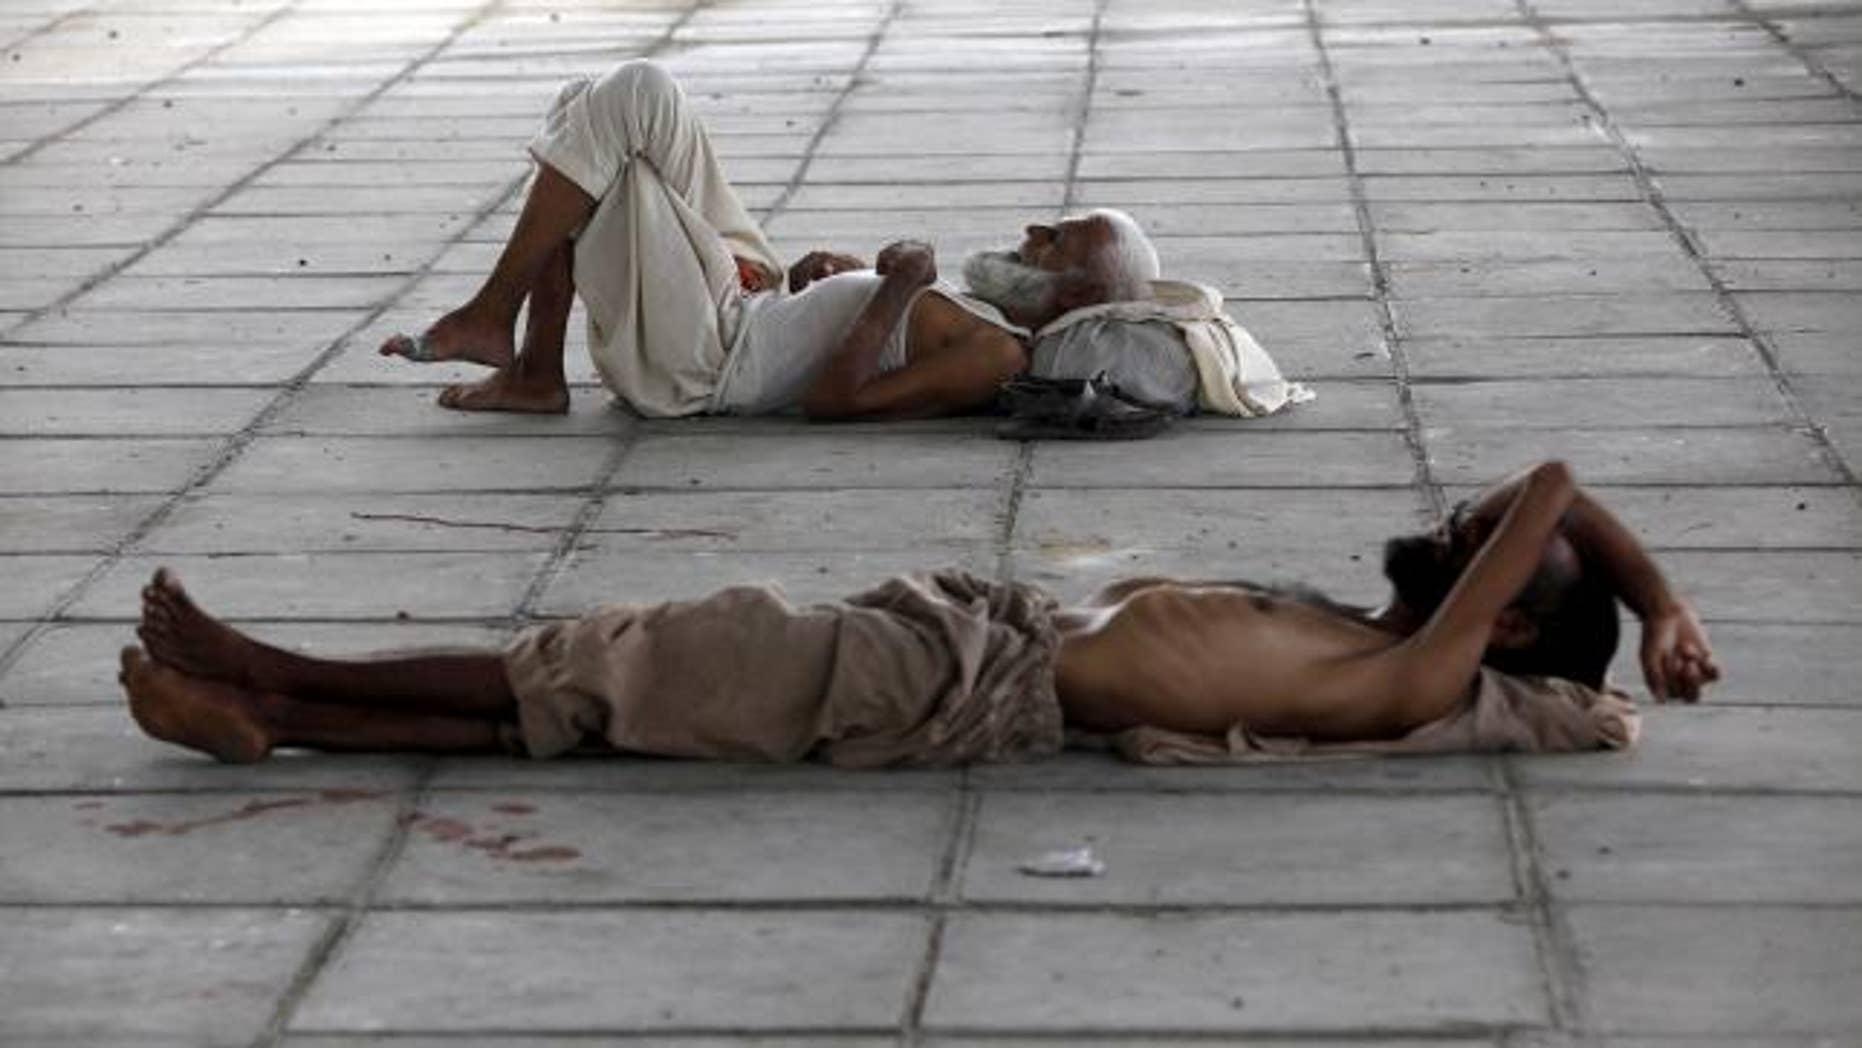 June 22, 2015: Men sleep in shade under a bridge during intense hot weather in Karachi, Pakistan.